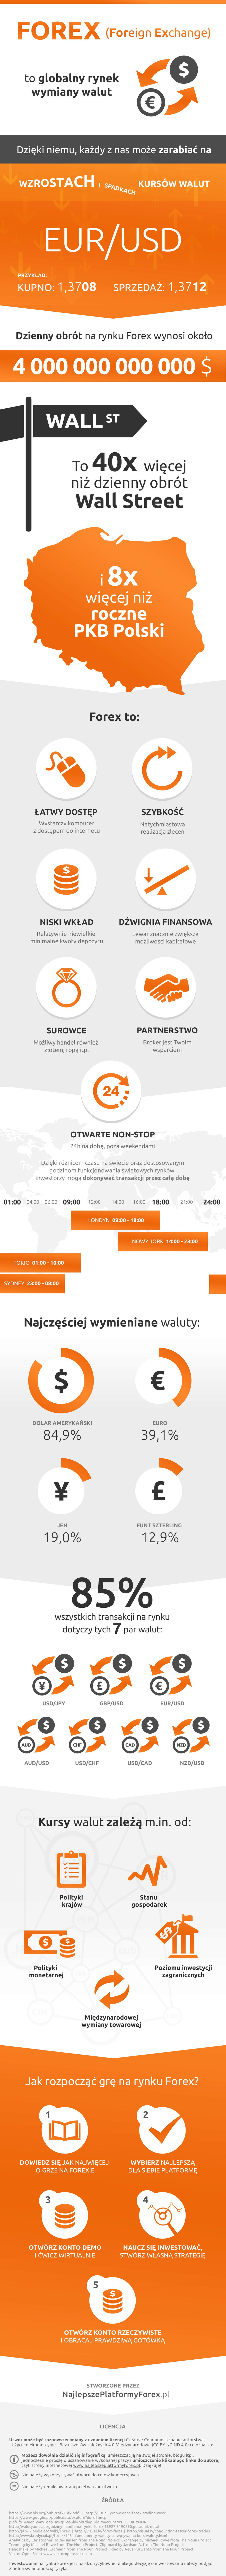 infografika forex